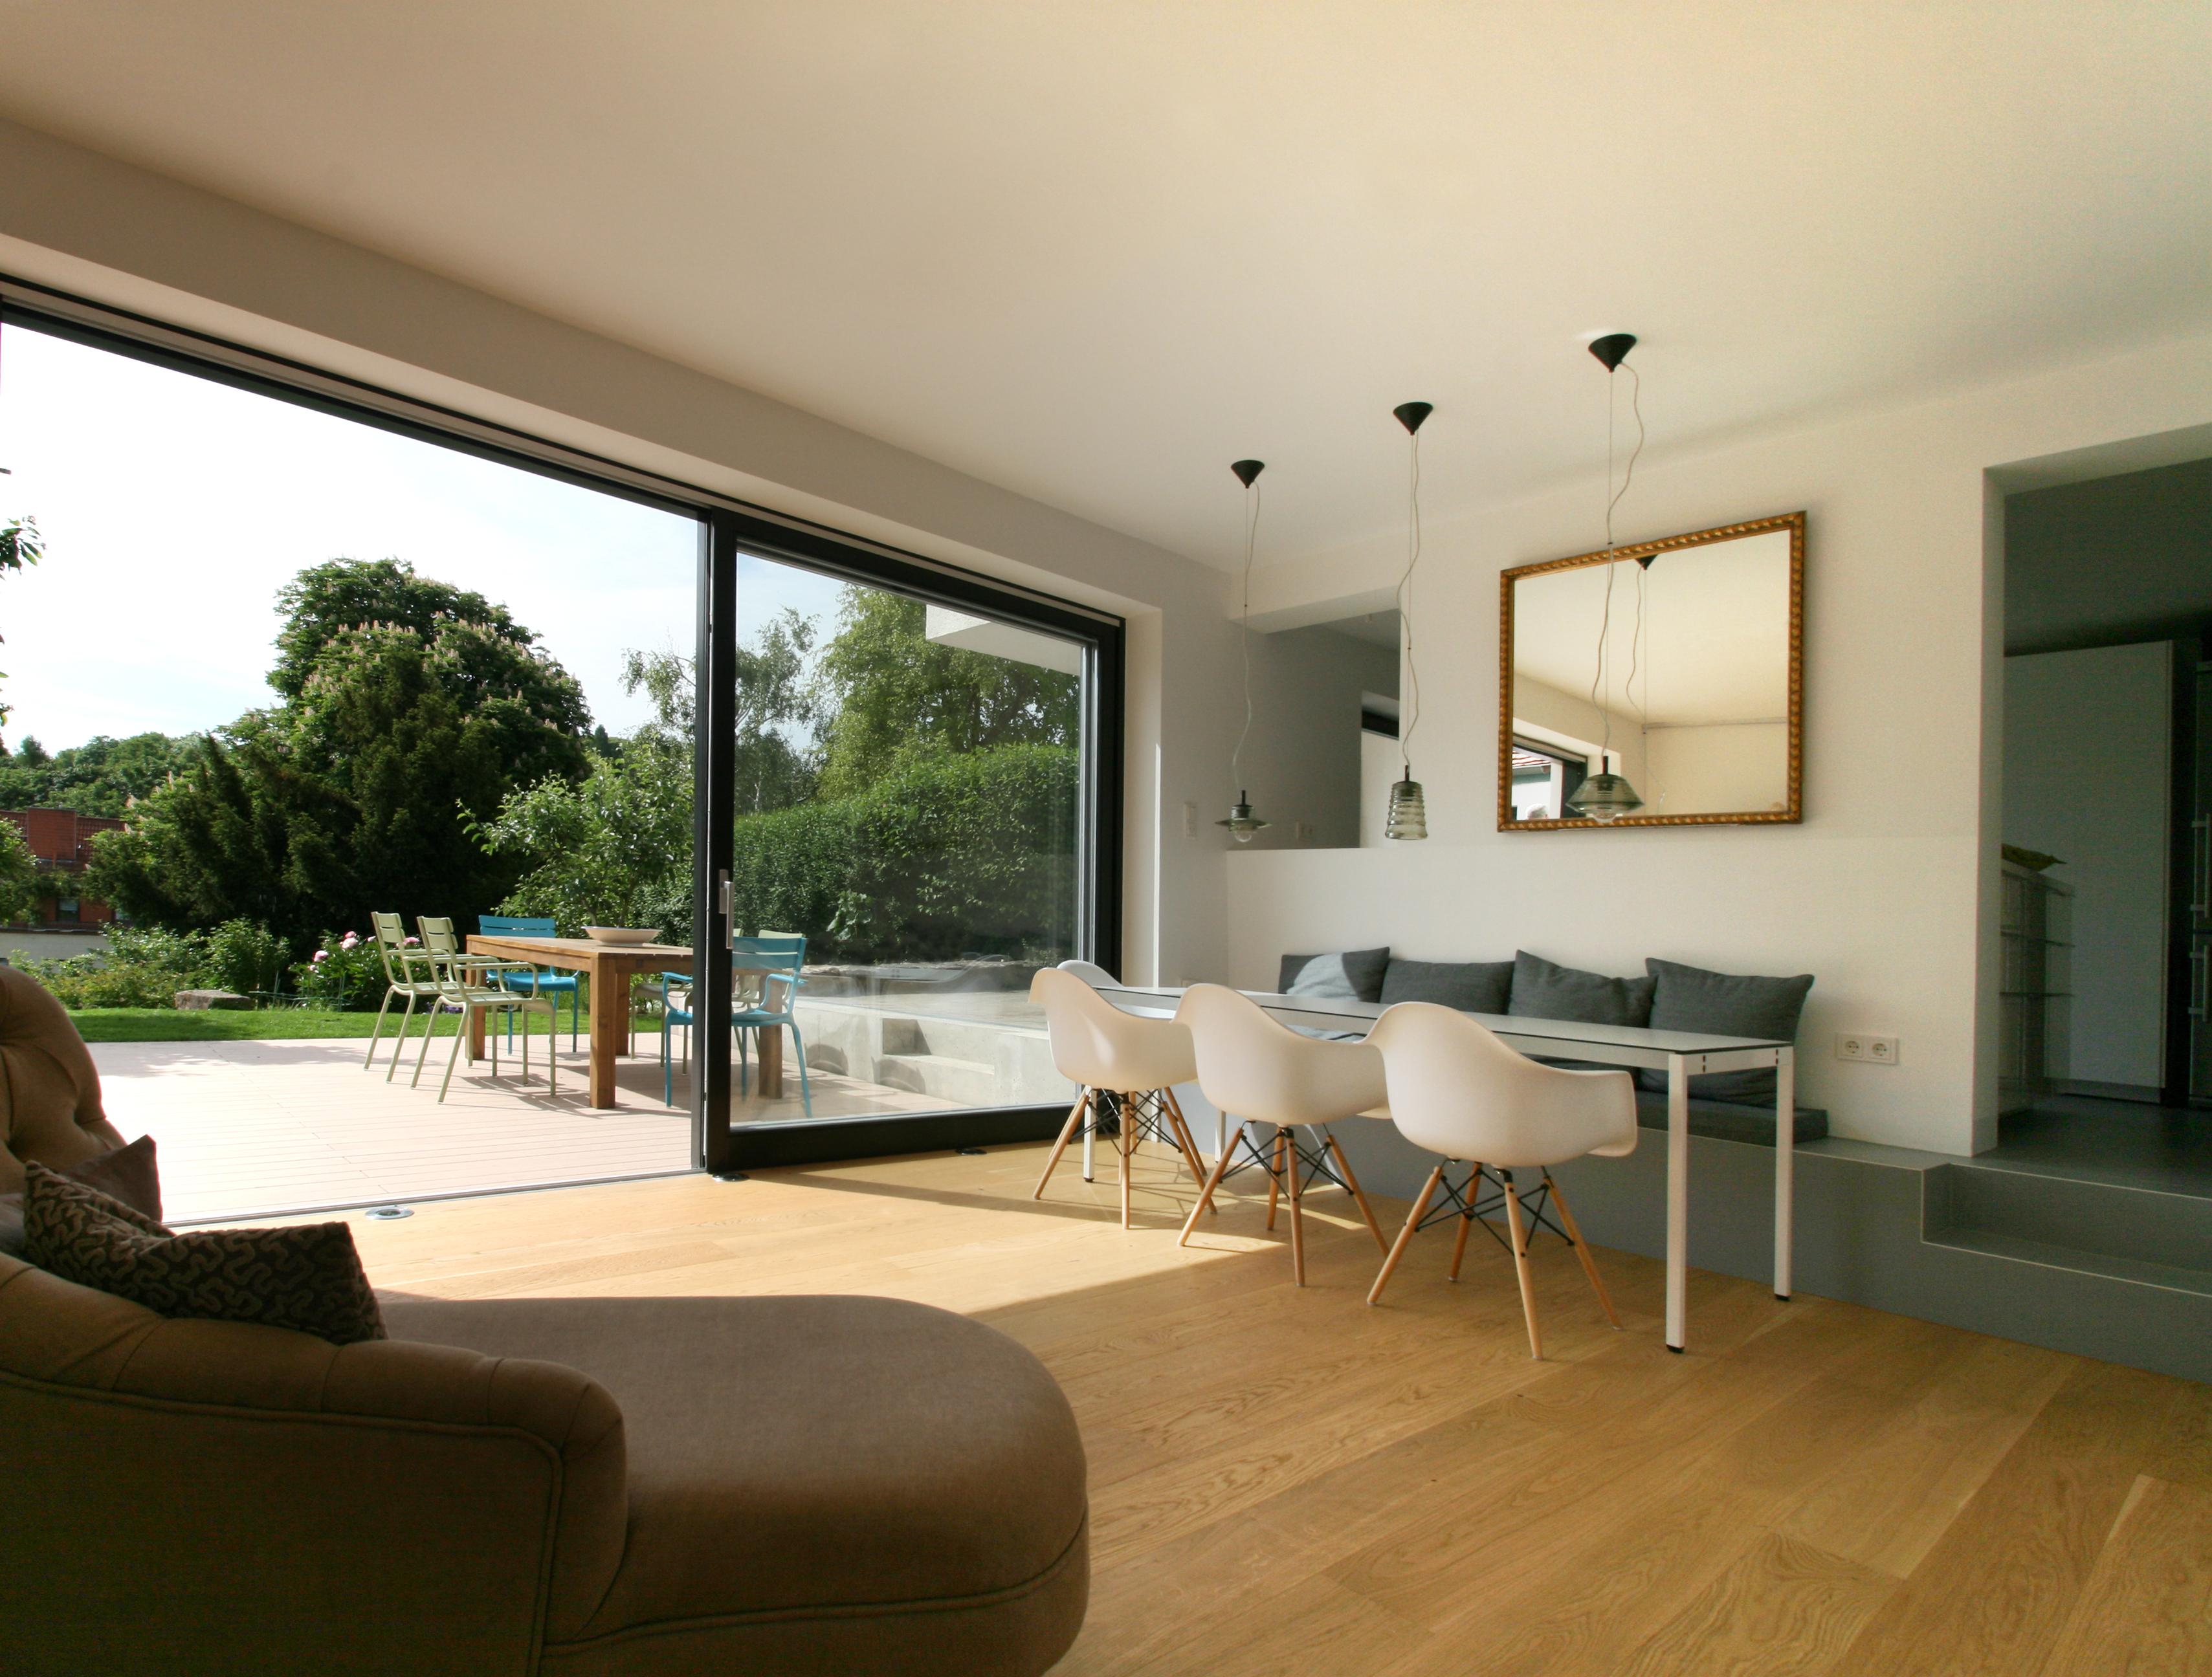 Wohnraum, Bild: Dma